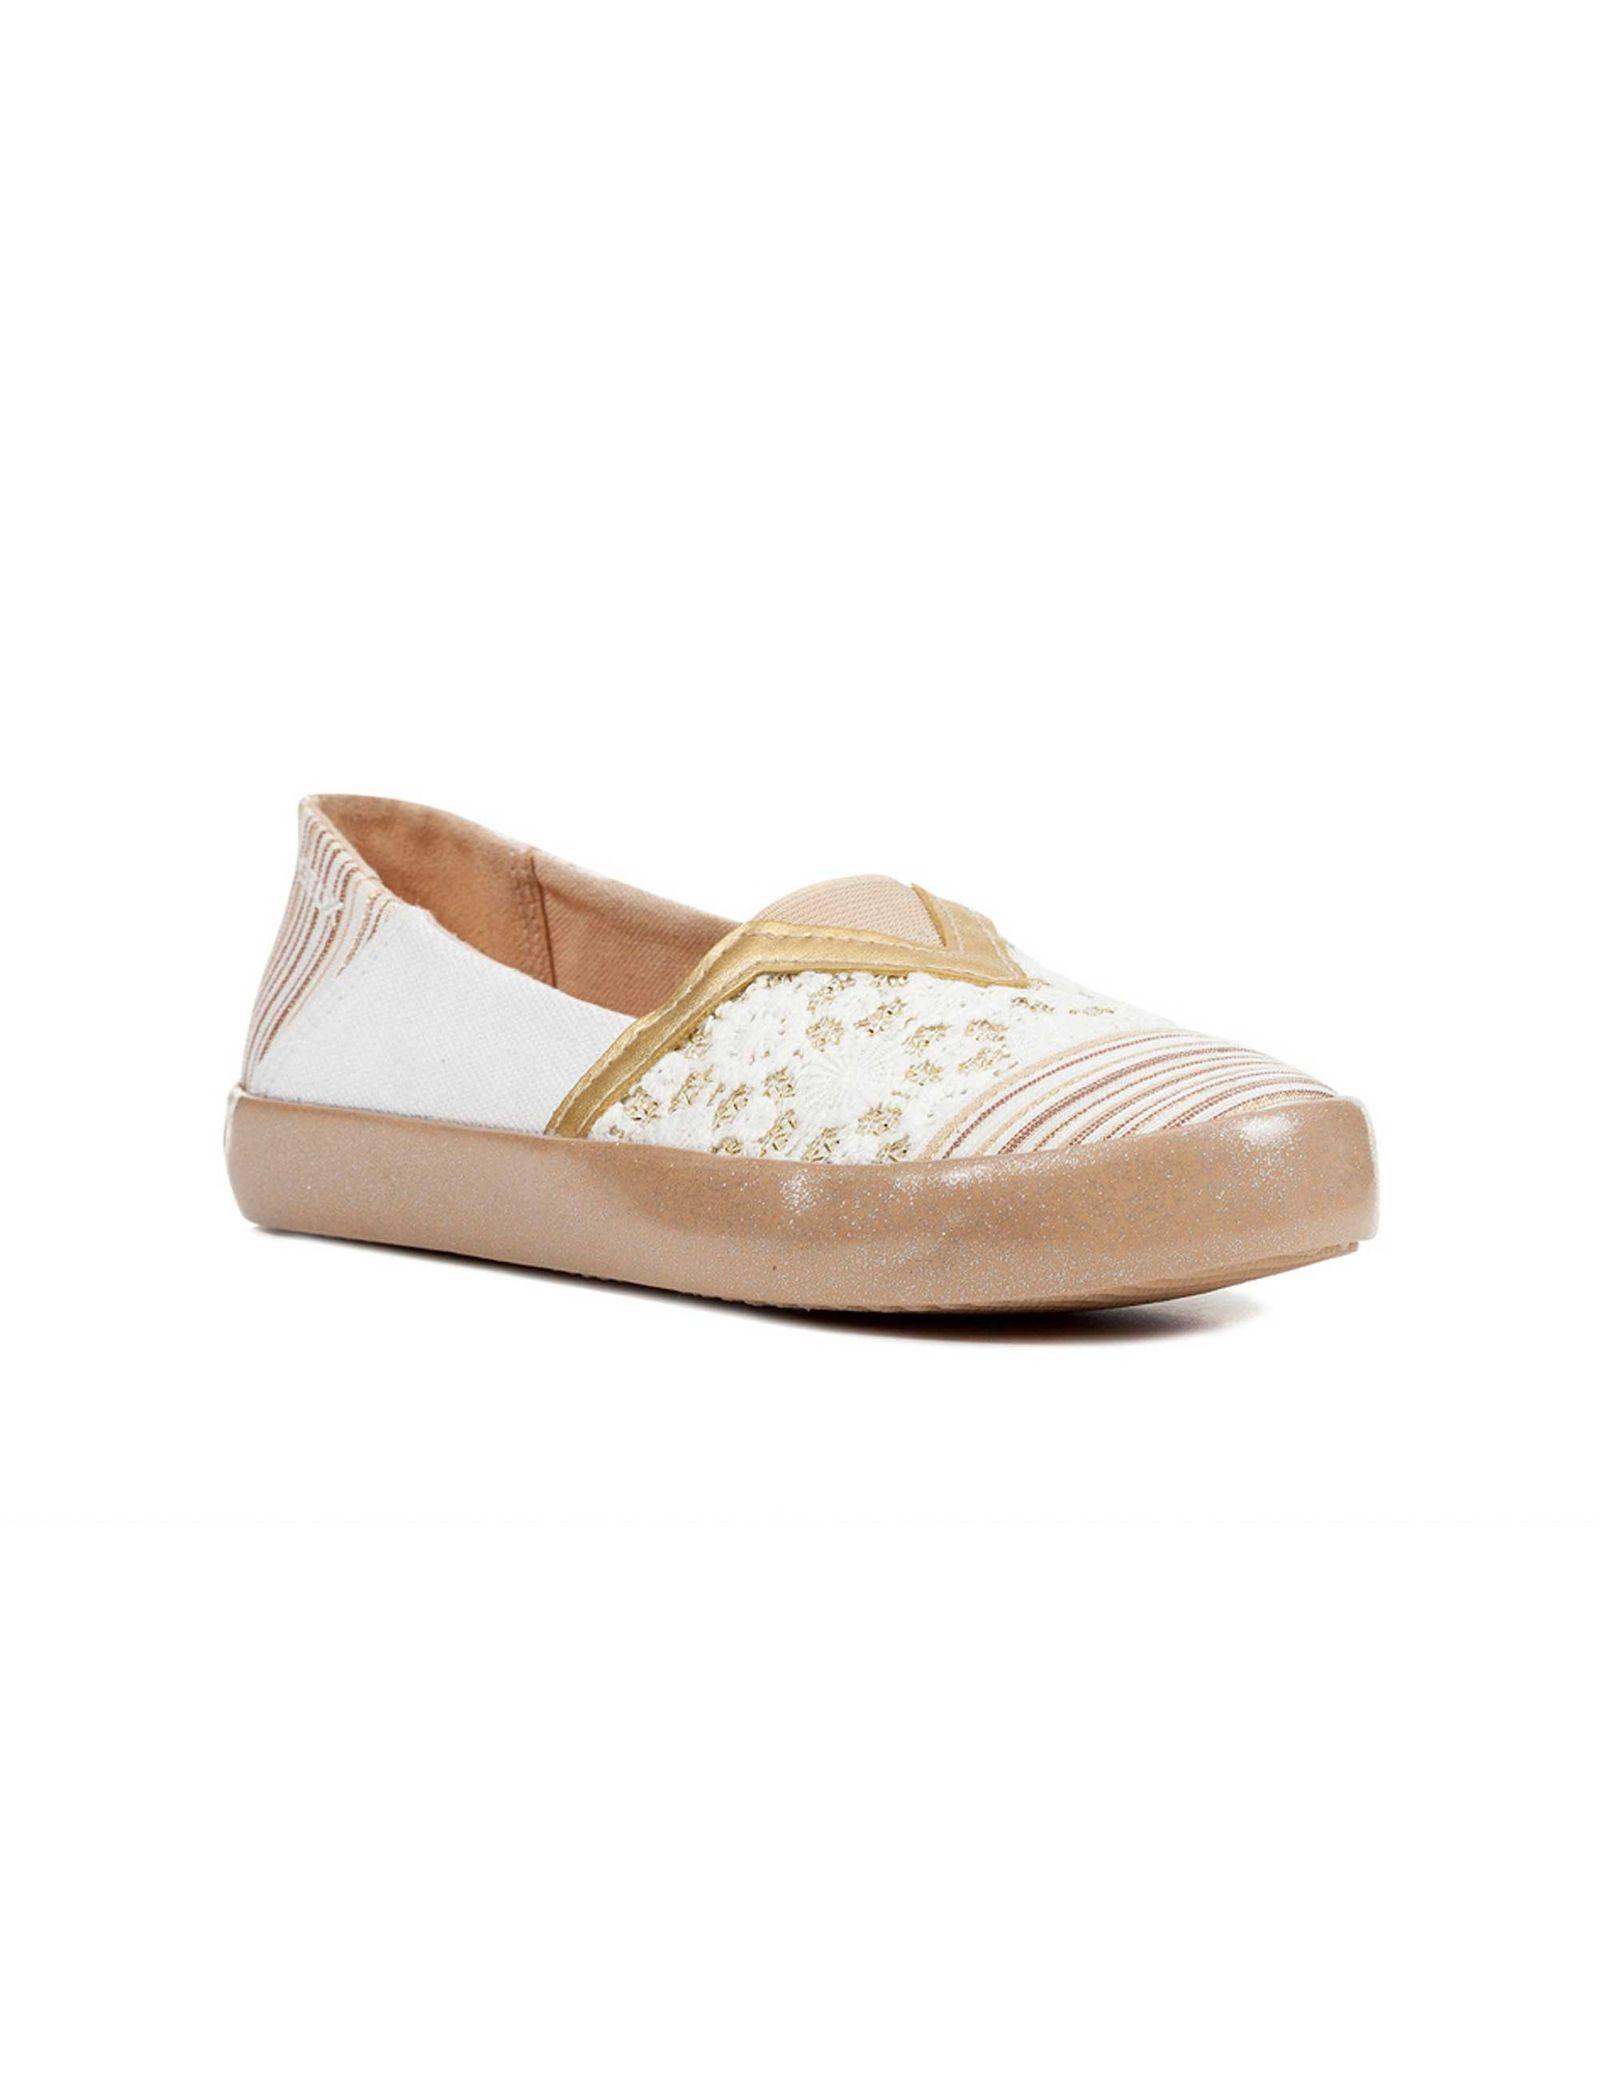 کفش تخت دخترانه JR KILWI - جی اوکس - طلايي - 2